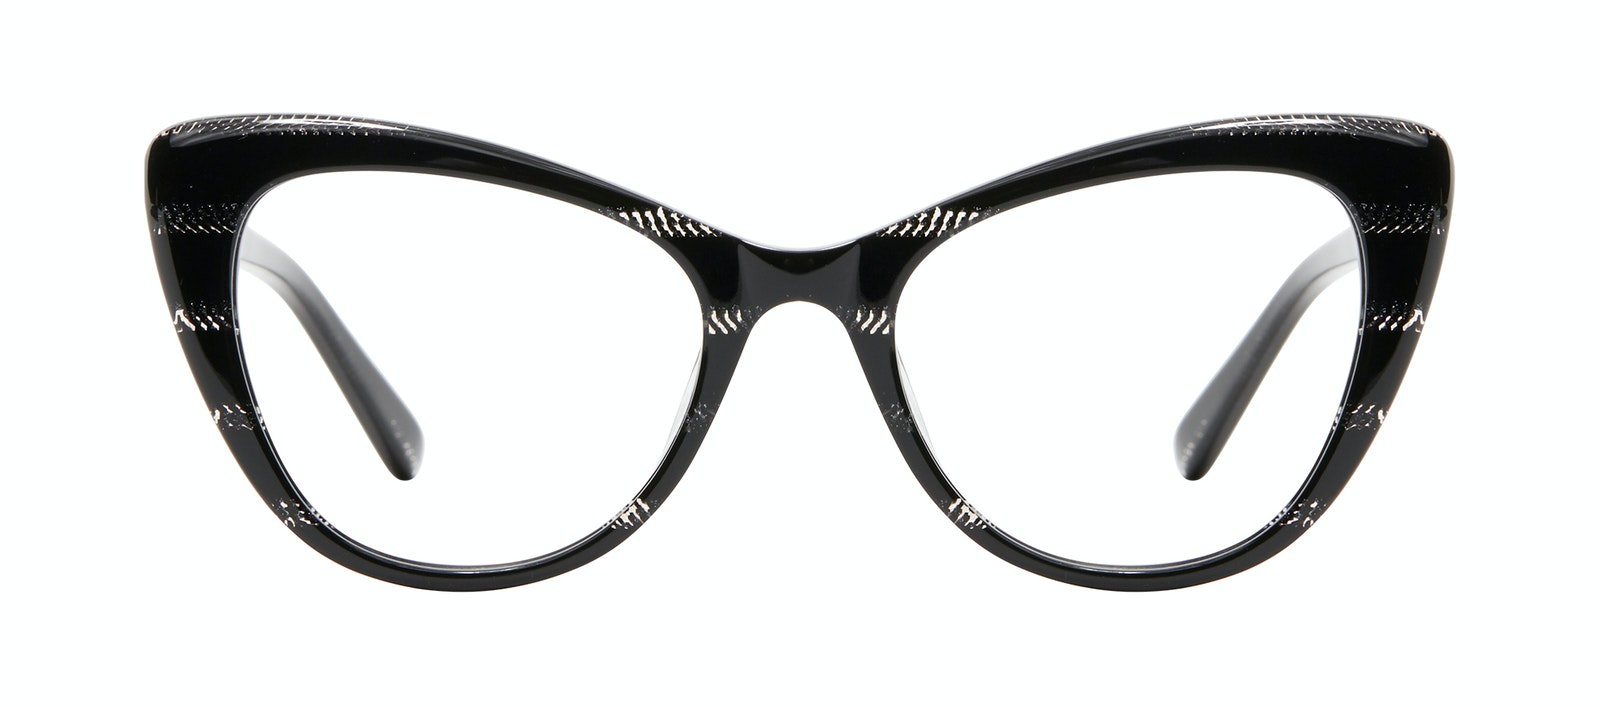 Affordable Fashion Glasses Cat Eye Eyeglasses Women Verve M Night Front